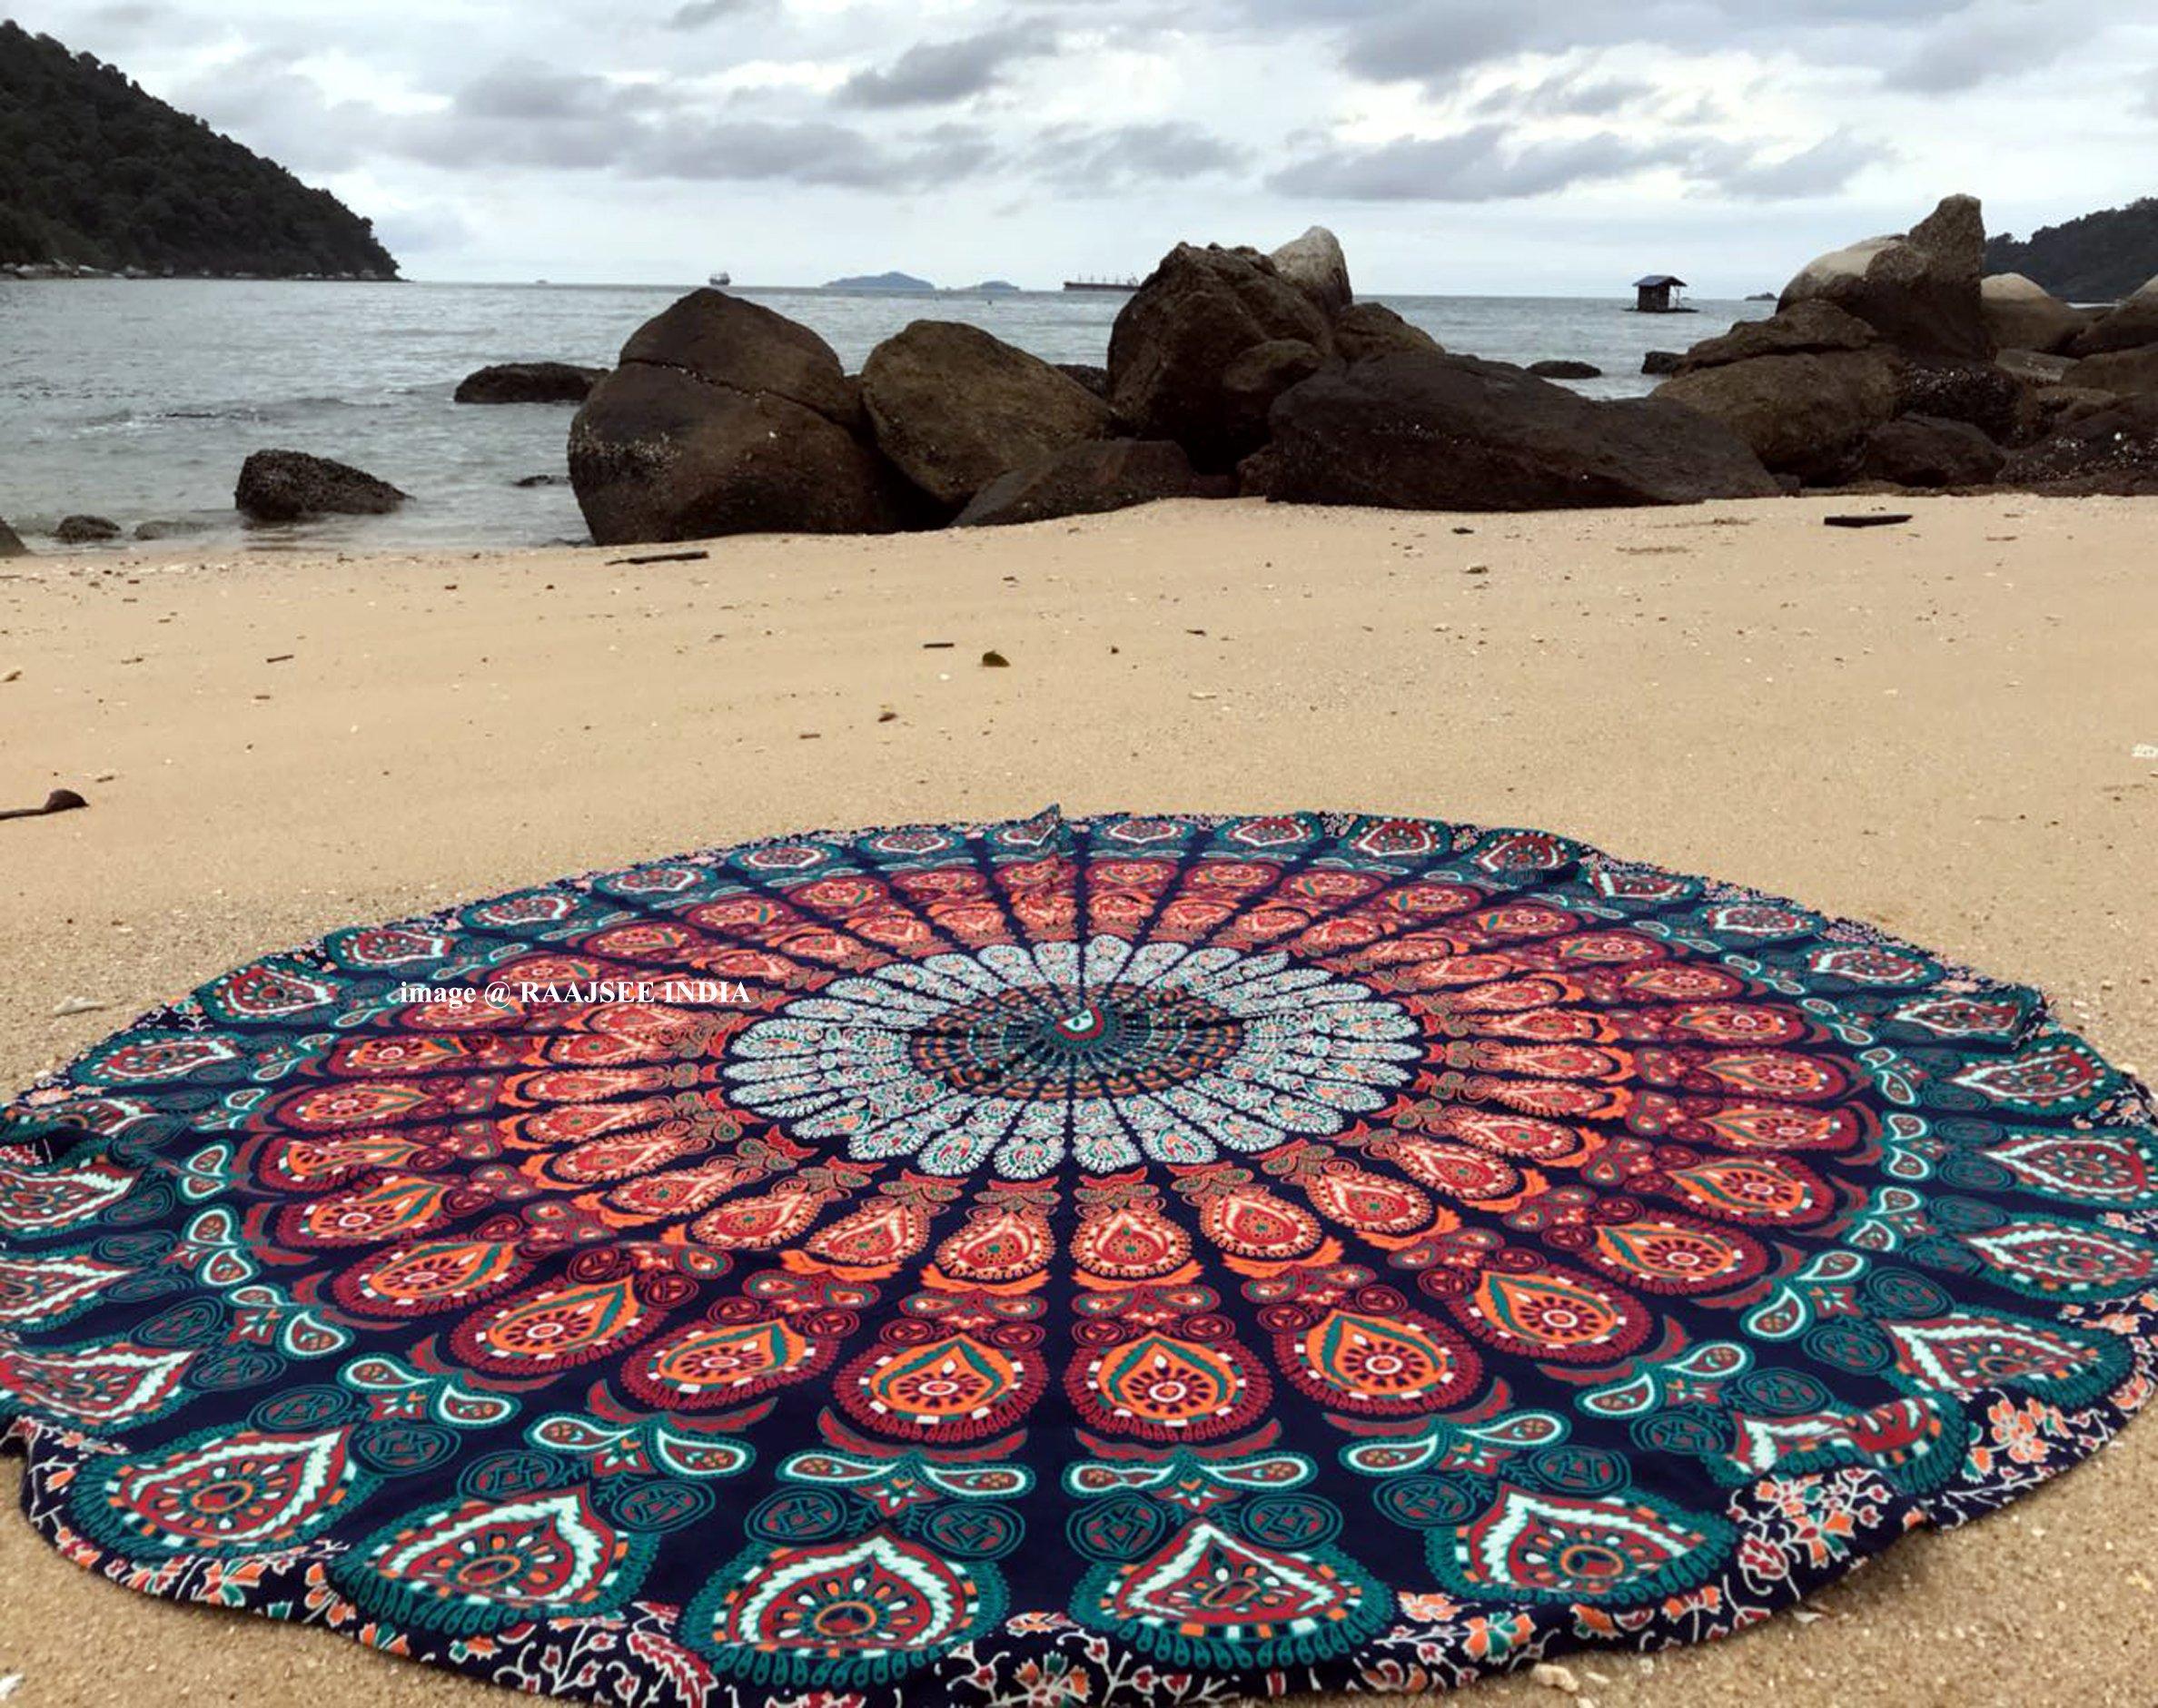 raajsee Round Beach Tapestry hippie/Boho Mandala Beach Towel Blanket Indian Cotton Bohemian Round Table cloth Mandala Decor/Yoga Mat Meditation Picnic Rugs 75 inch Circle (Blue Orange)